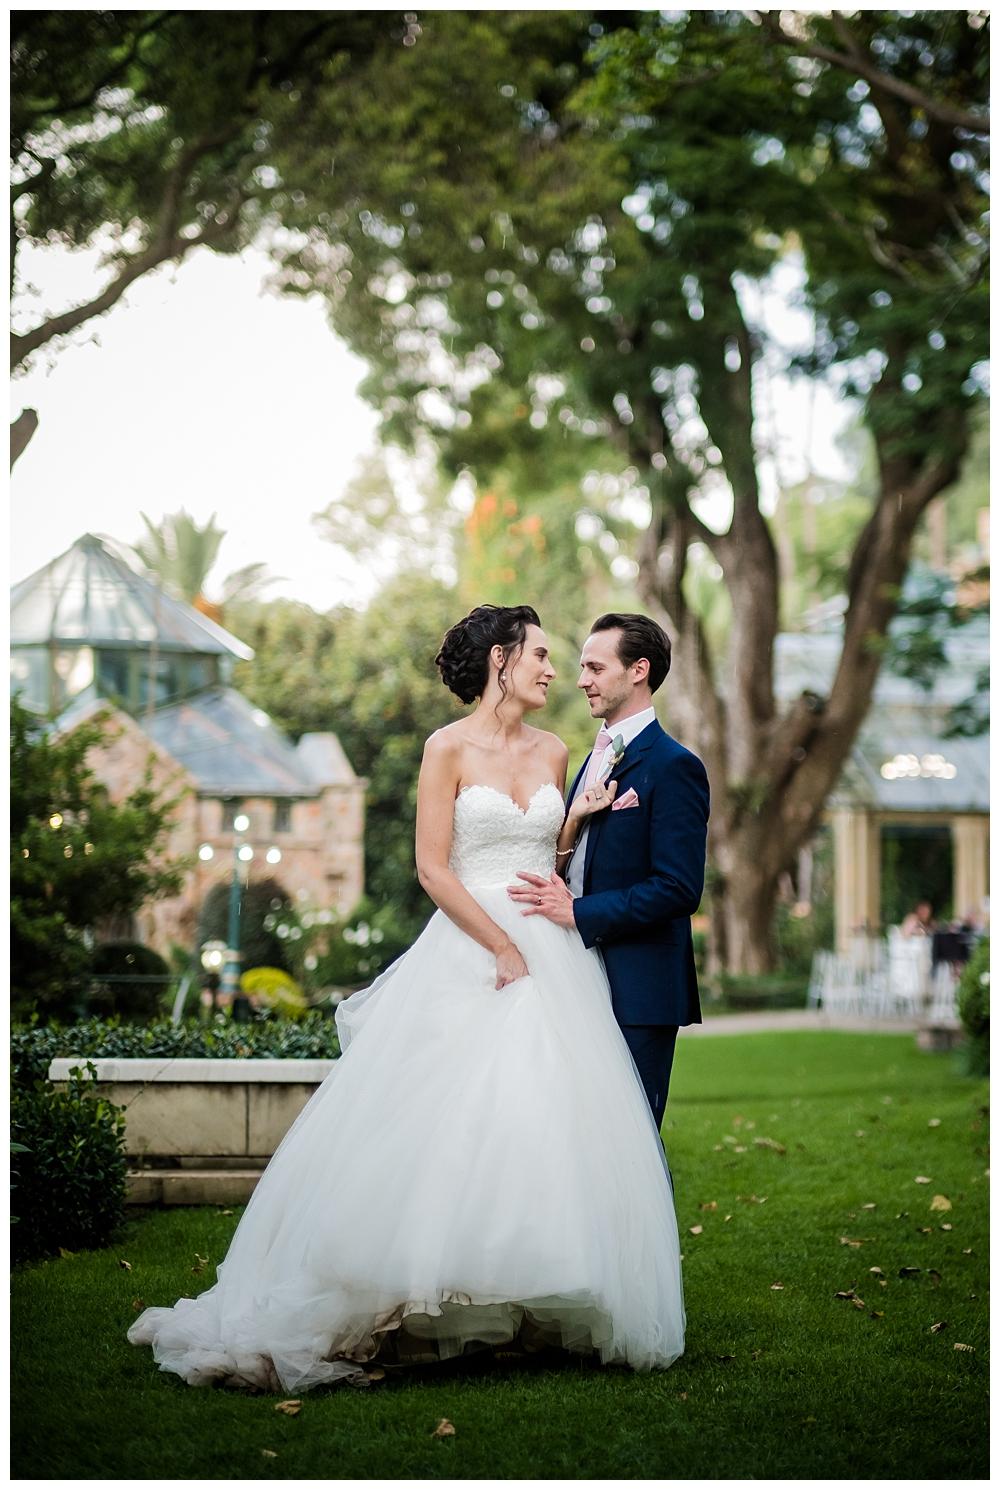 Best_Wedding_Photographer_AlexanderSmith_1298.jpg